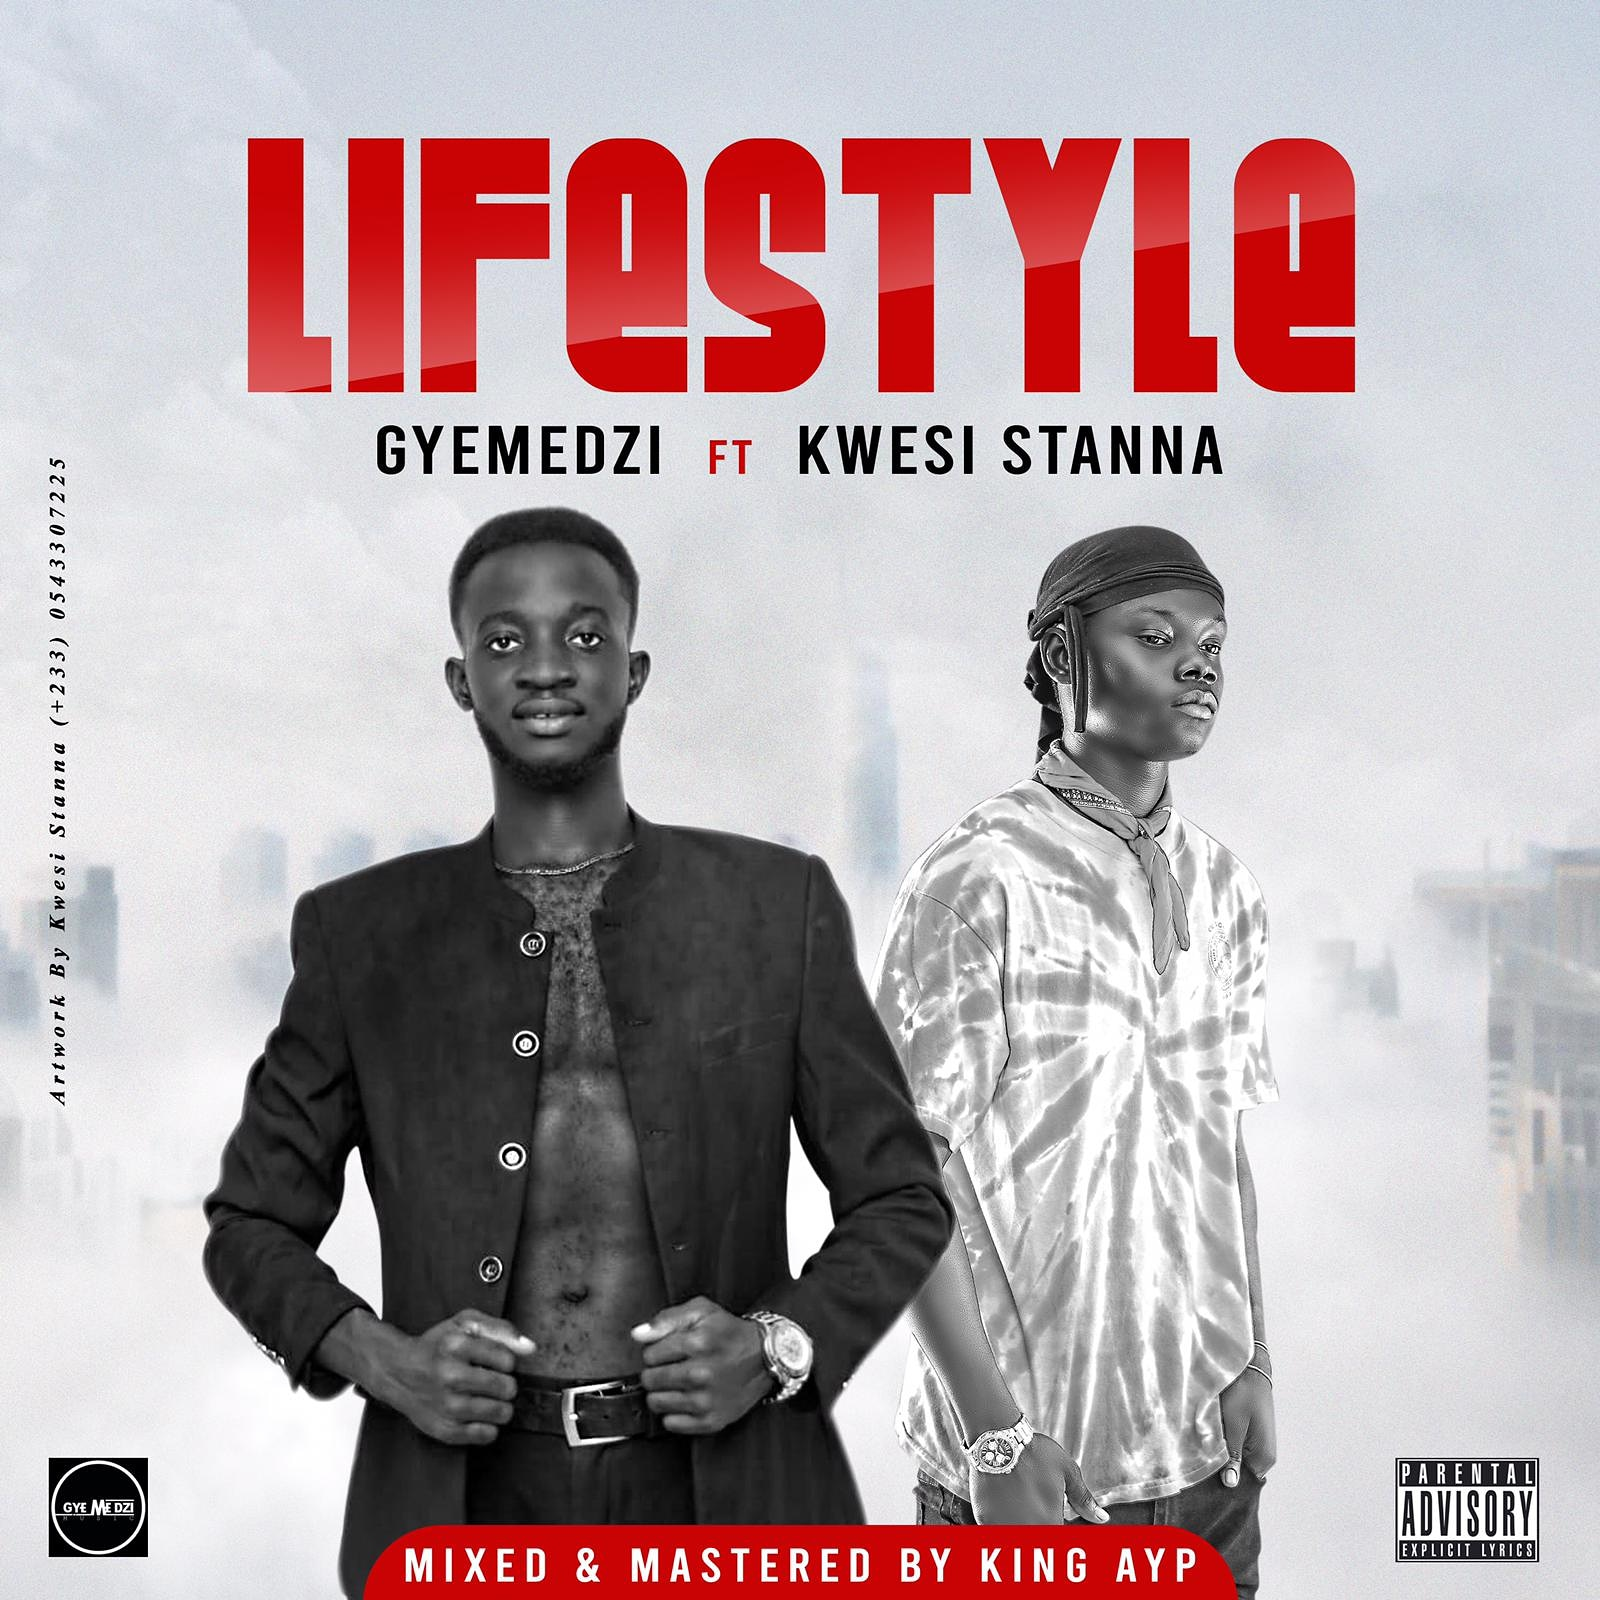 Gyemedzi - Lifestyle Ft Kwesi Stanna